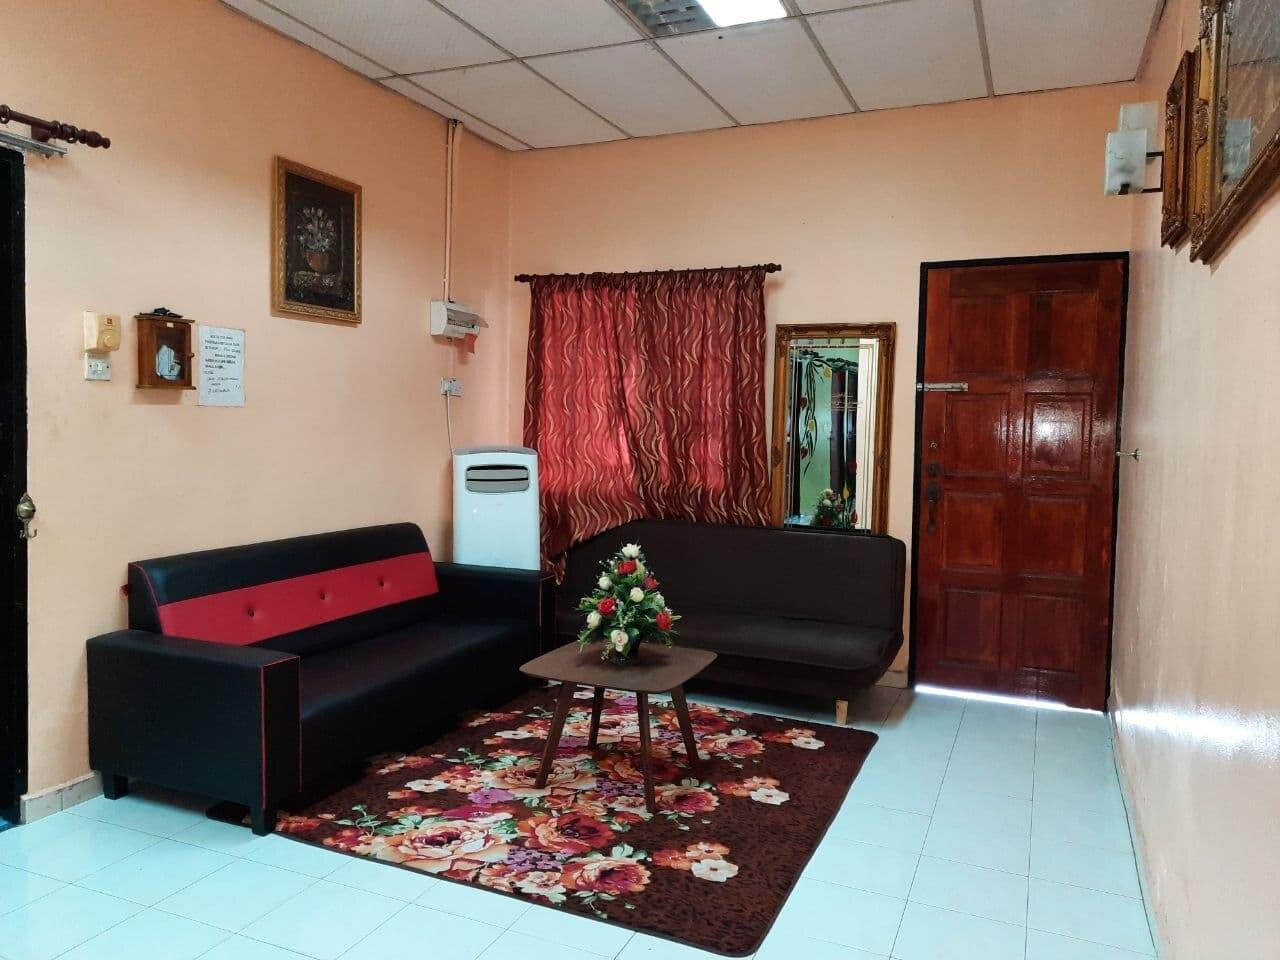 Home Stay Seri Manjung {10 pax stay}{WiFi}